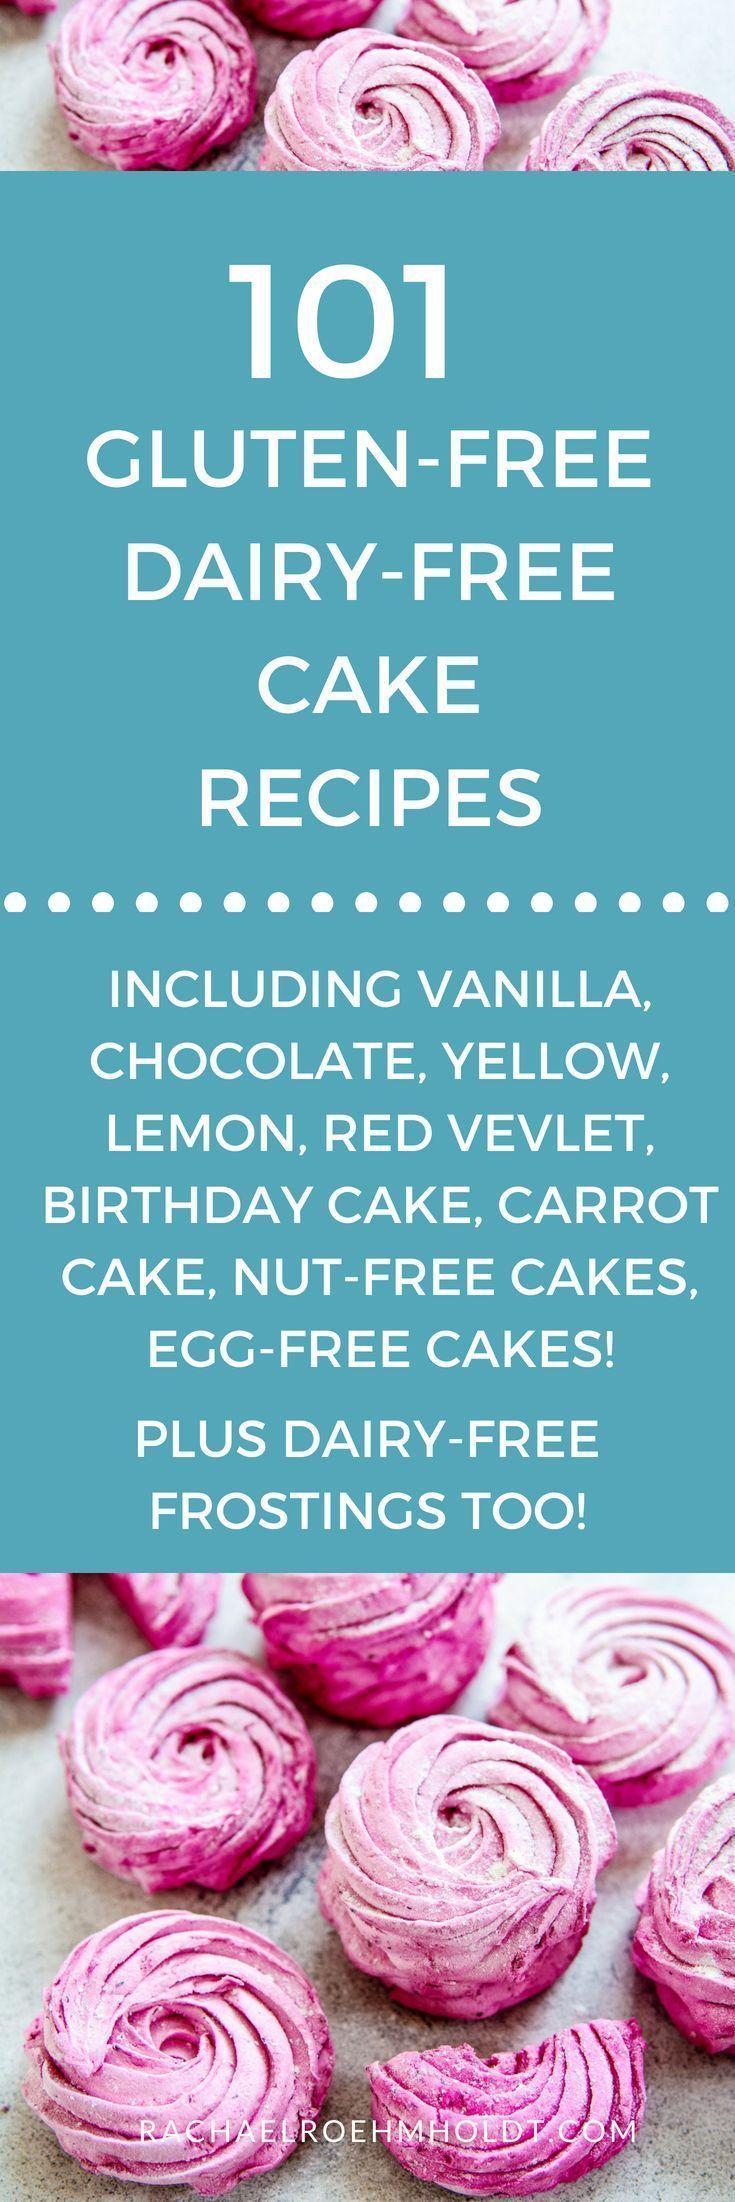 101 Gluten-free Dairy-free Cake Recipes -